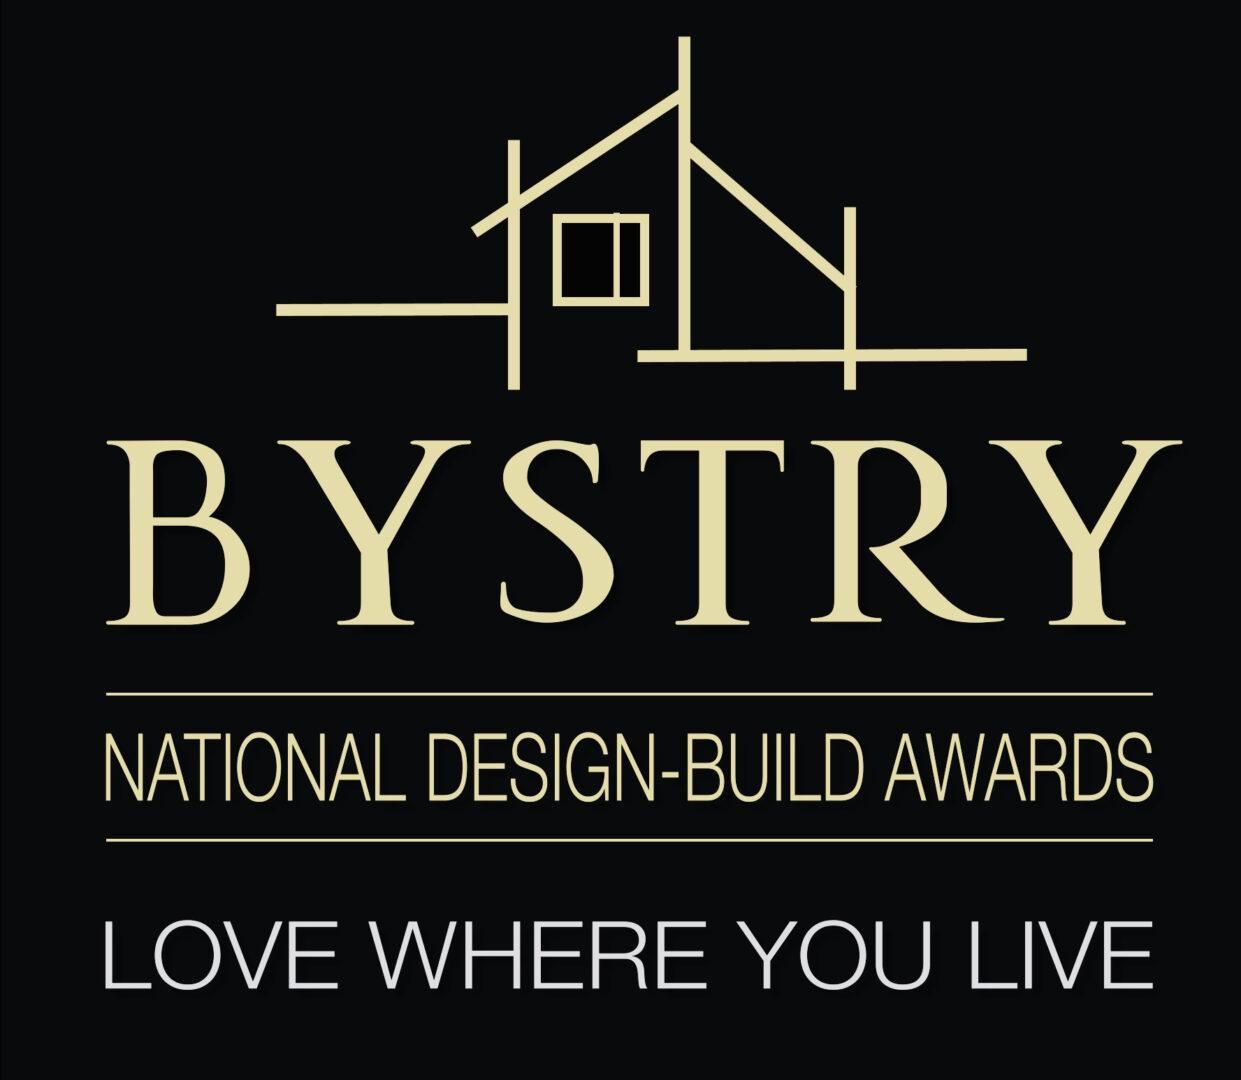 Bystry logo 2020 noWEB